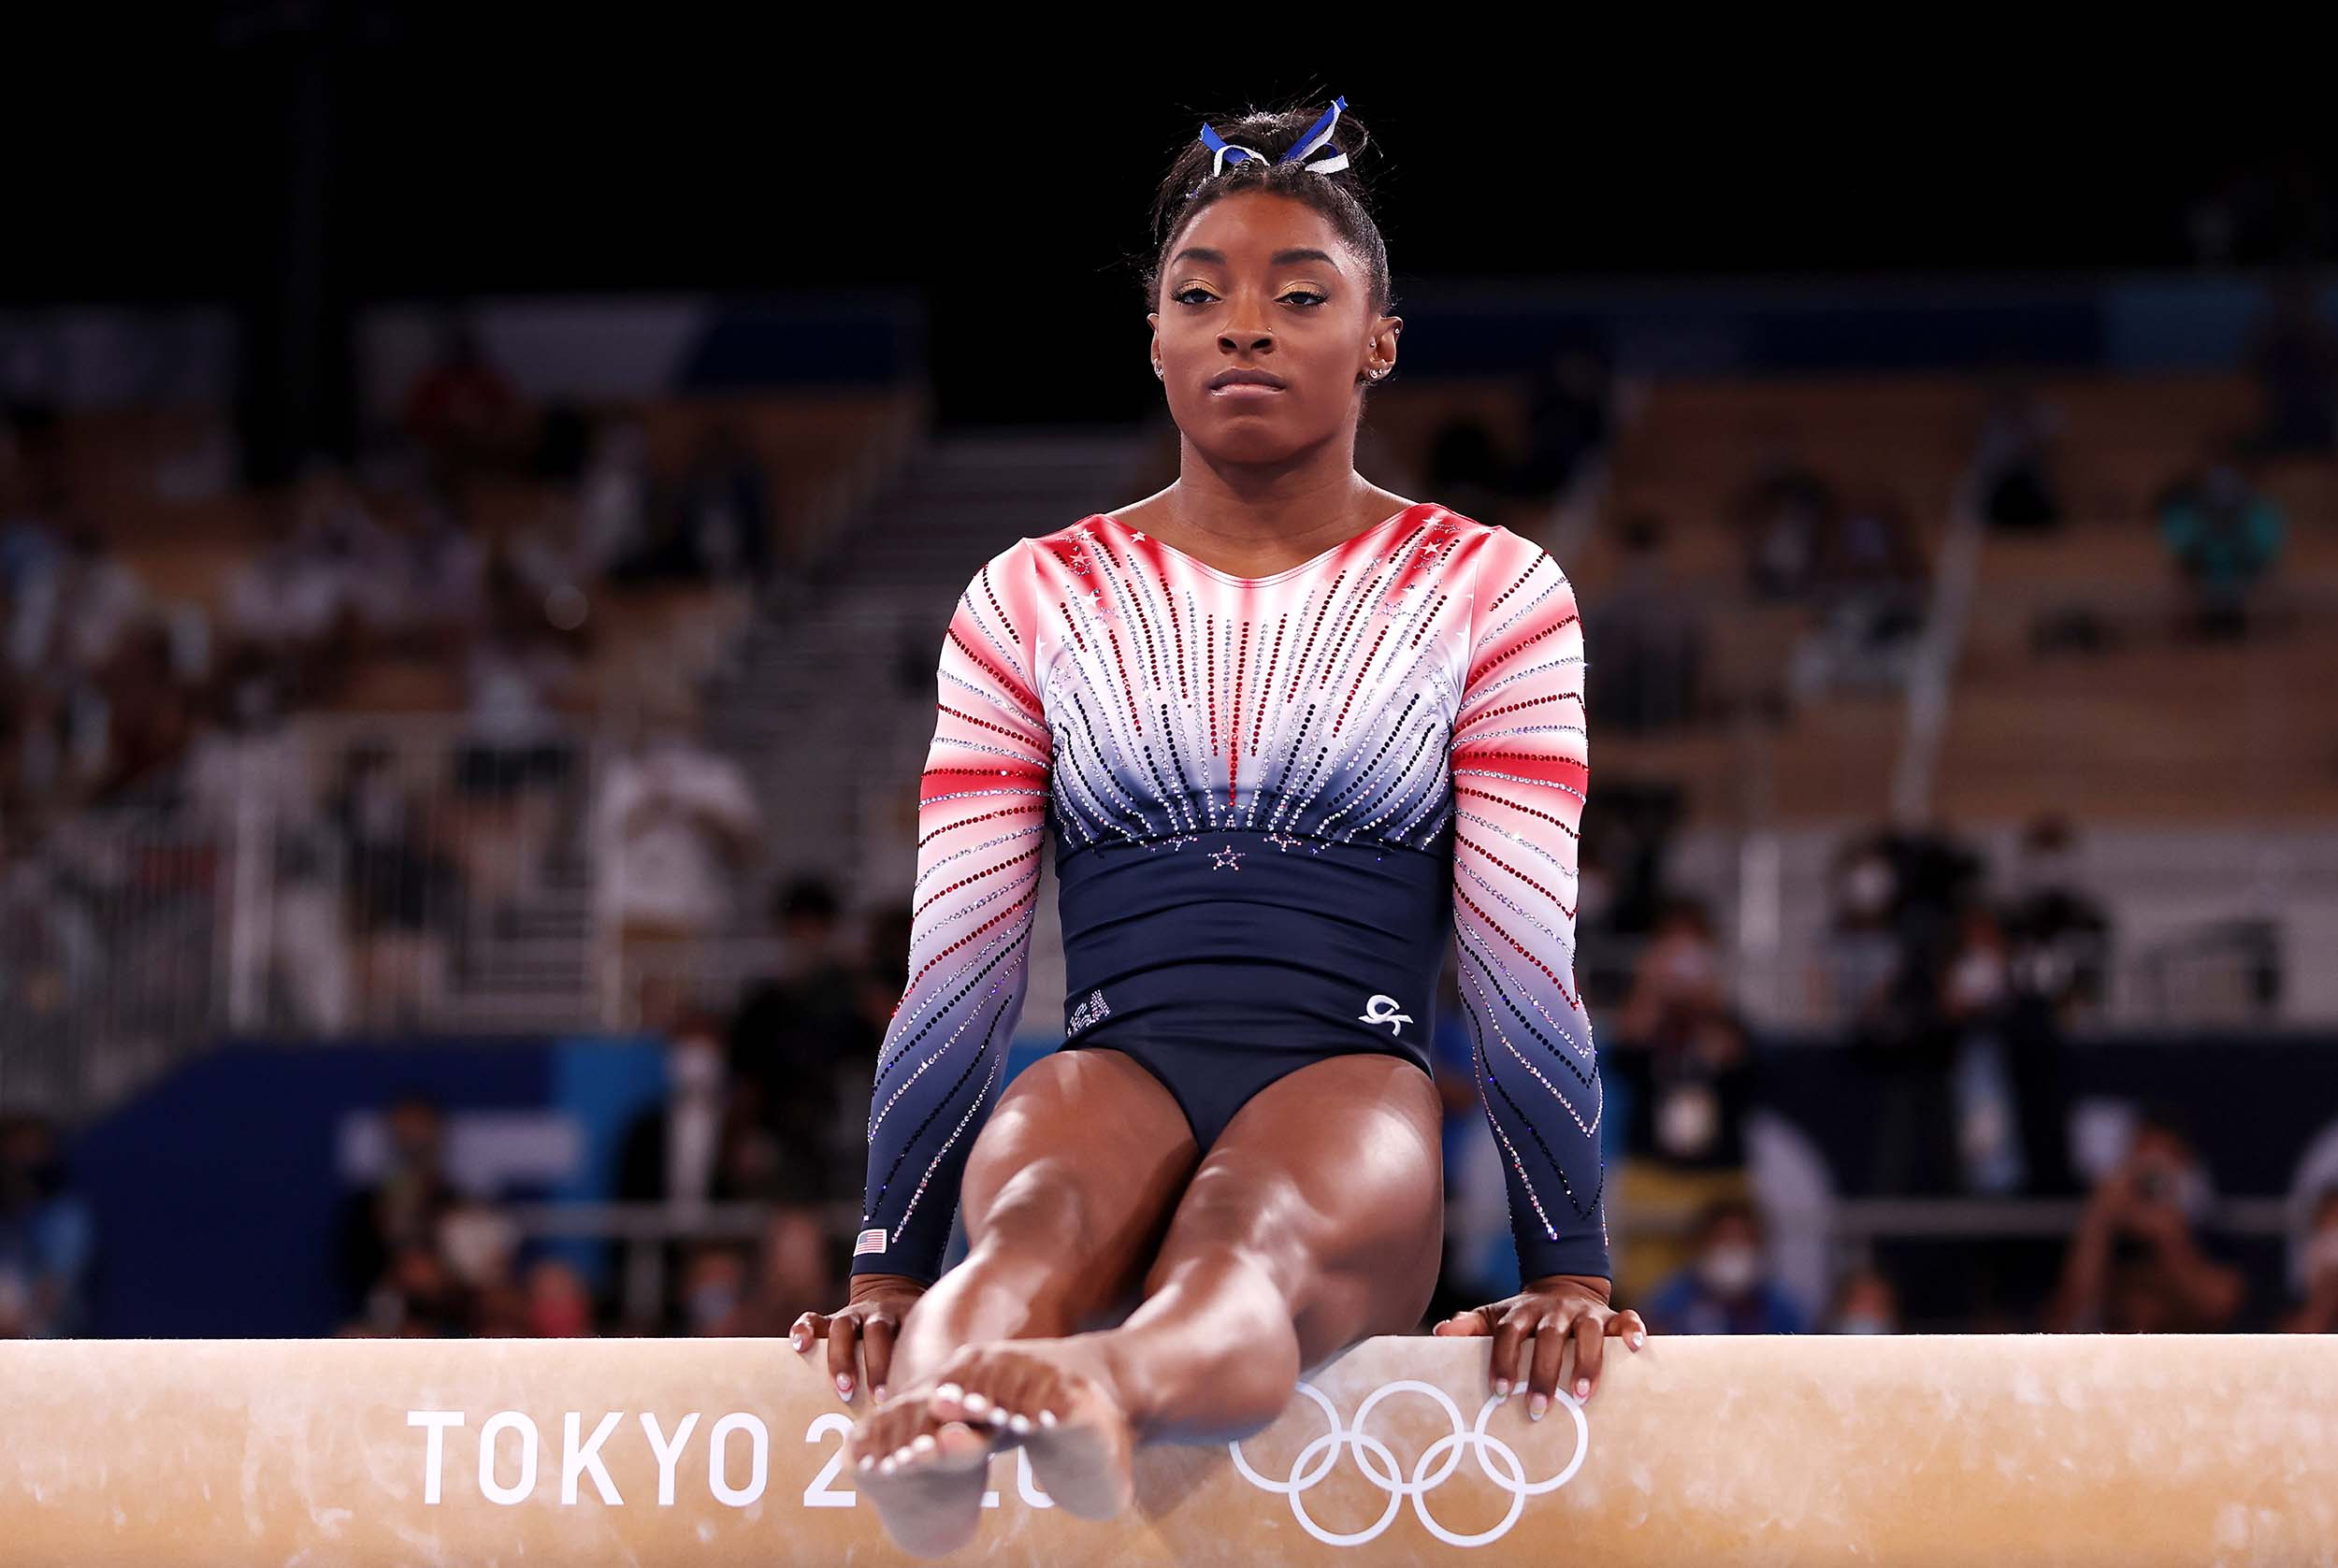 Olympics: Simone Biles Wins Bronze, Candy Jacobs Talks 'Inhumane' Housing